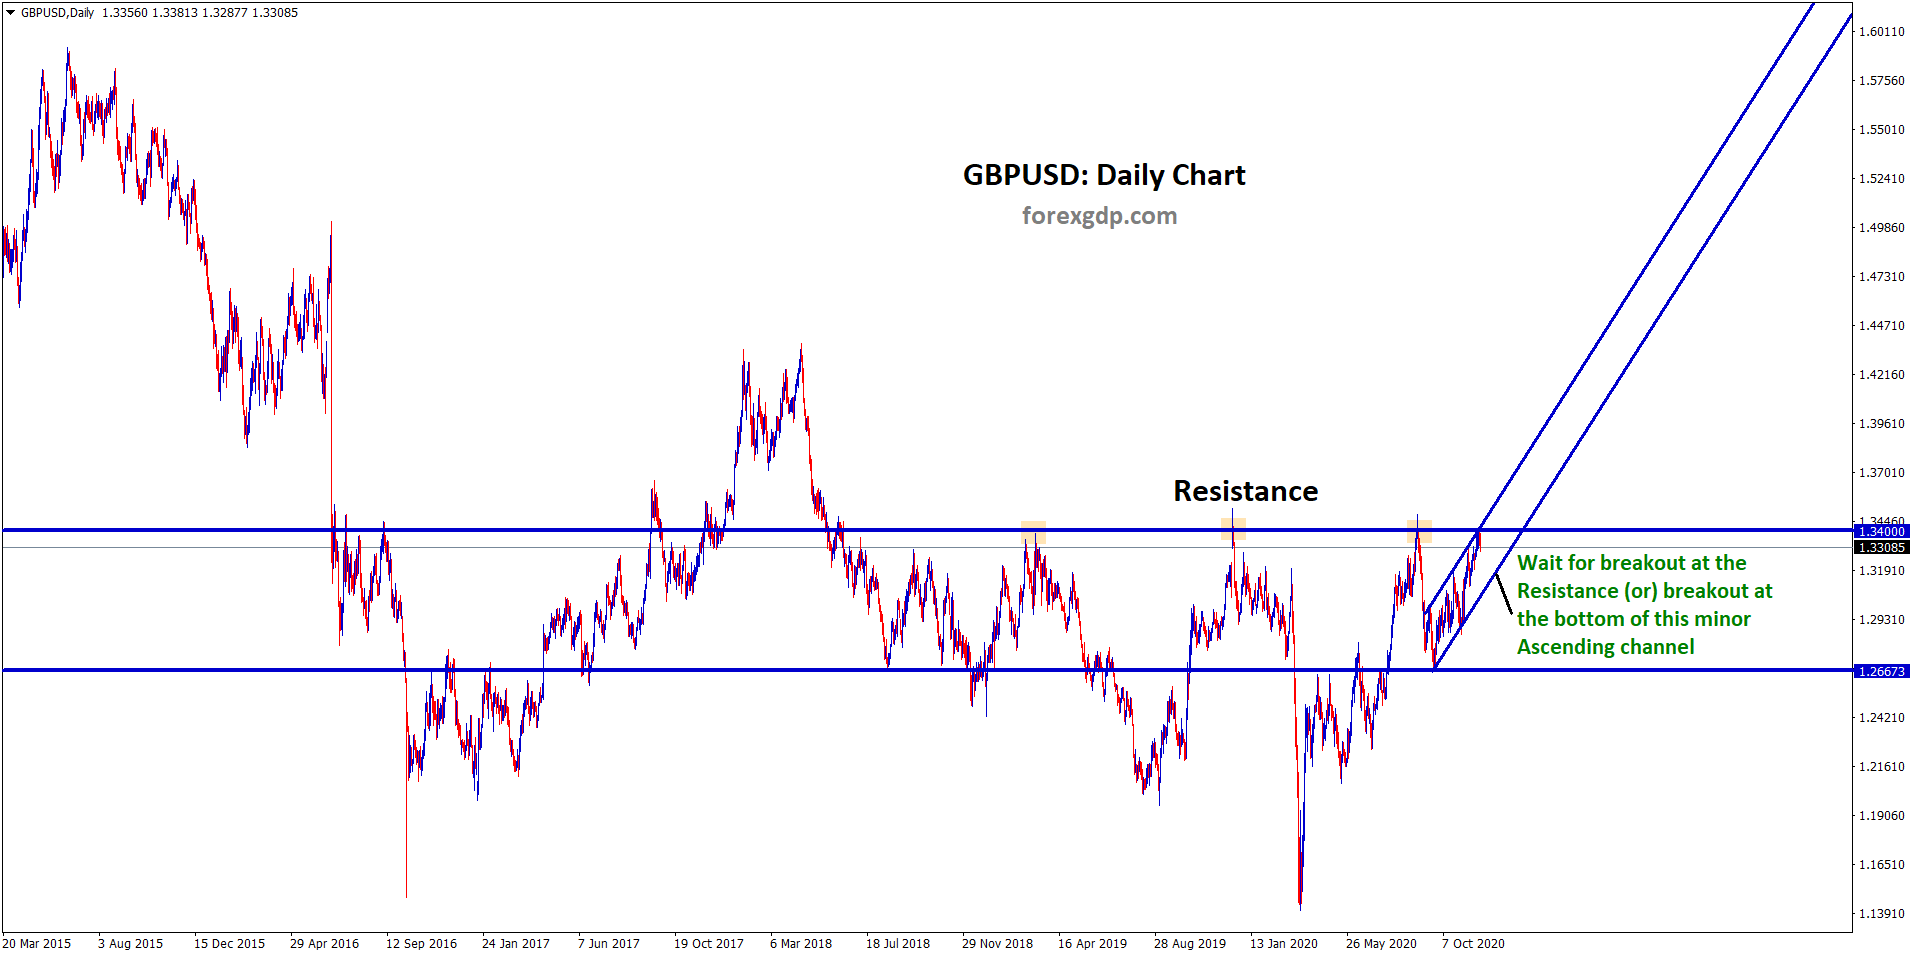 gbpusd resistance breakout analysis